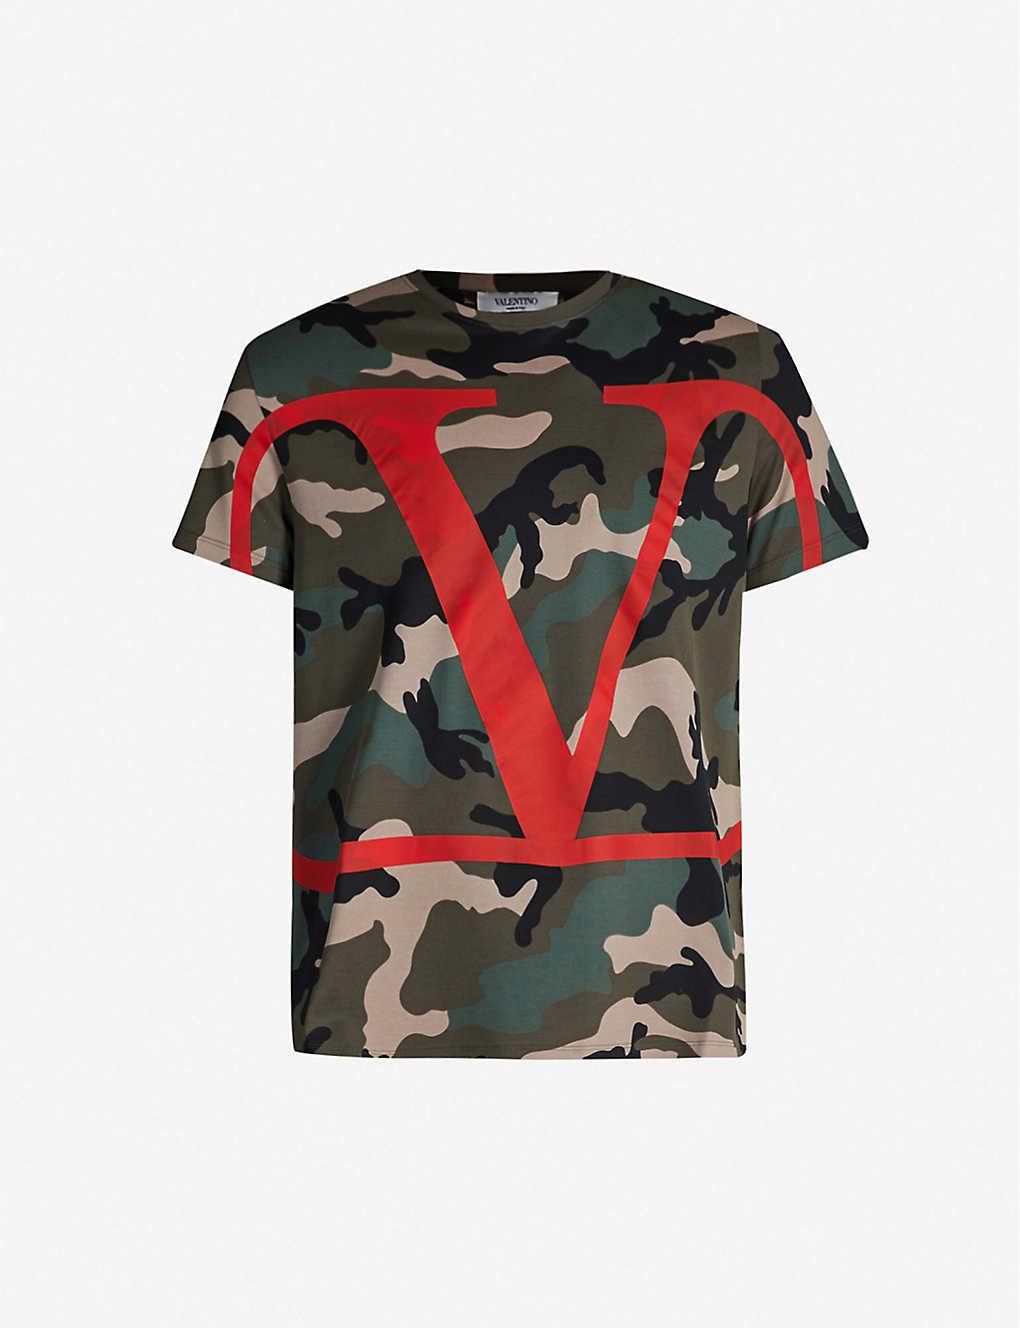 ee1ceb9aabcf VALENTINO - Logo-print camouflage cotton T-shirt | Selfridges.com